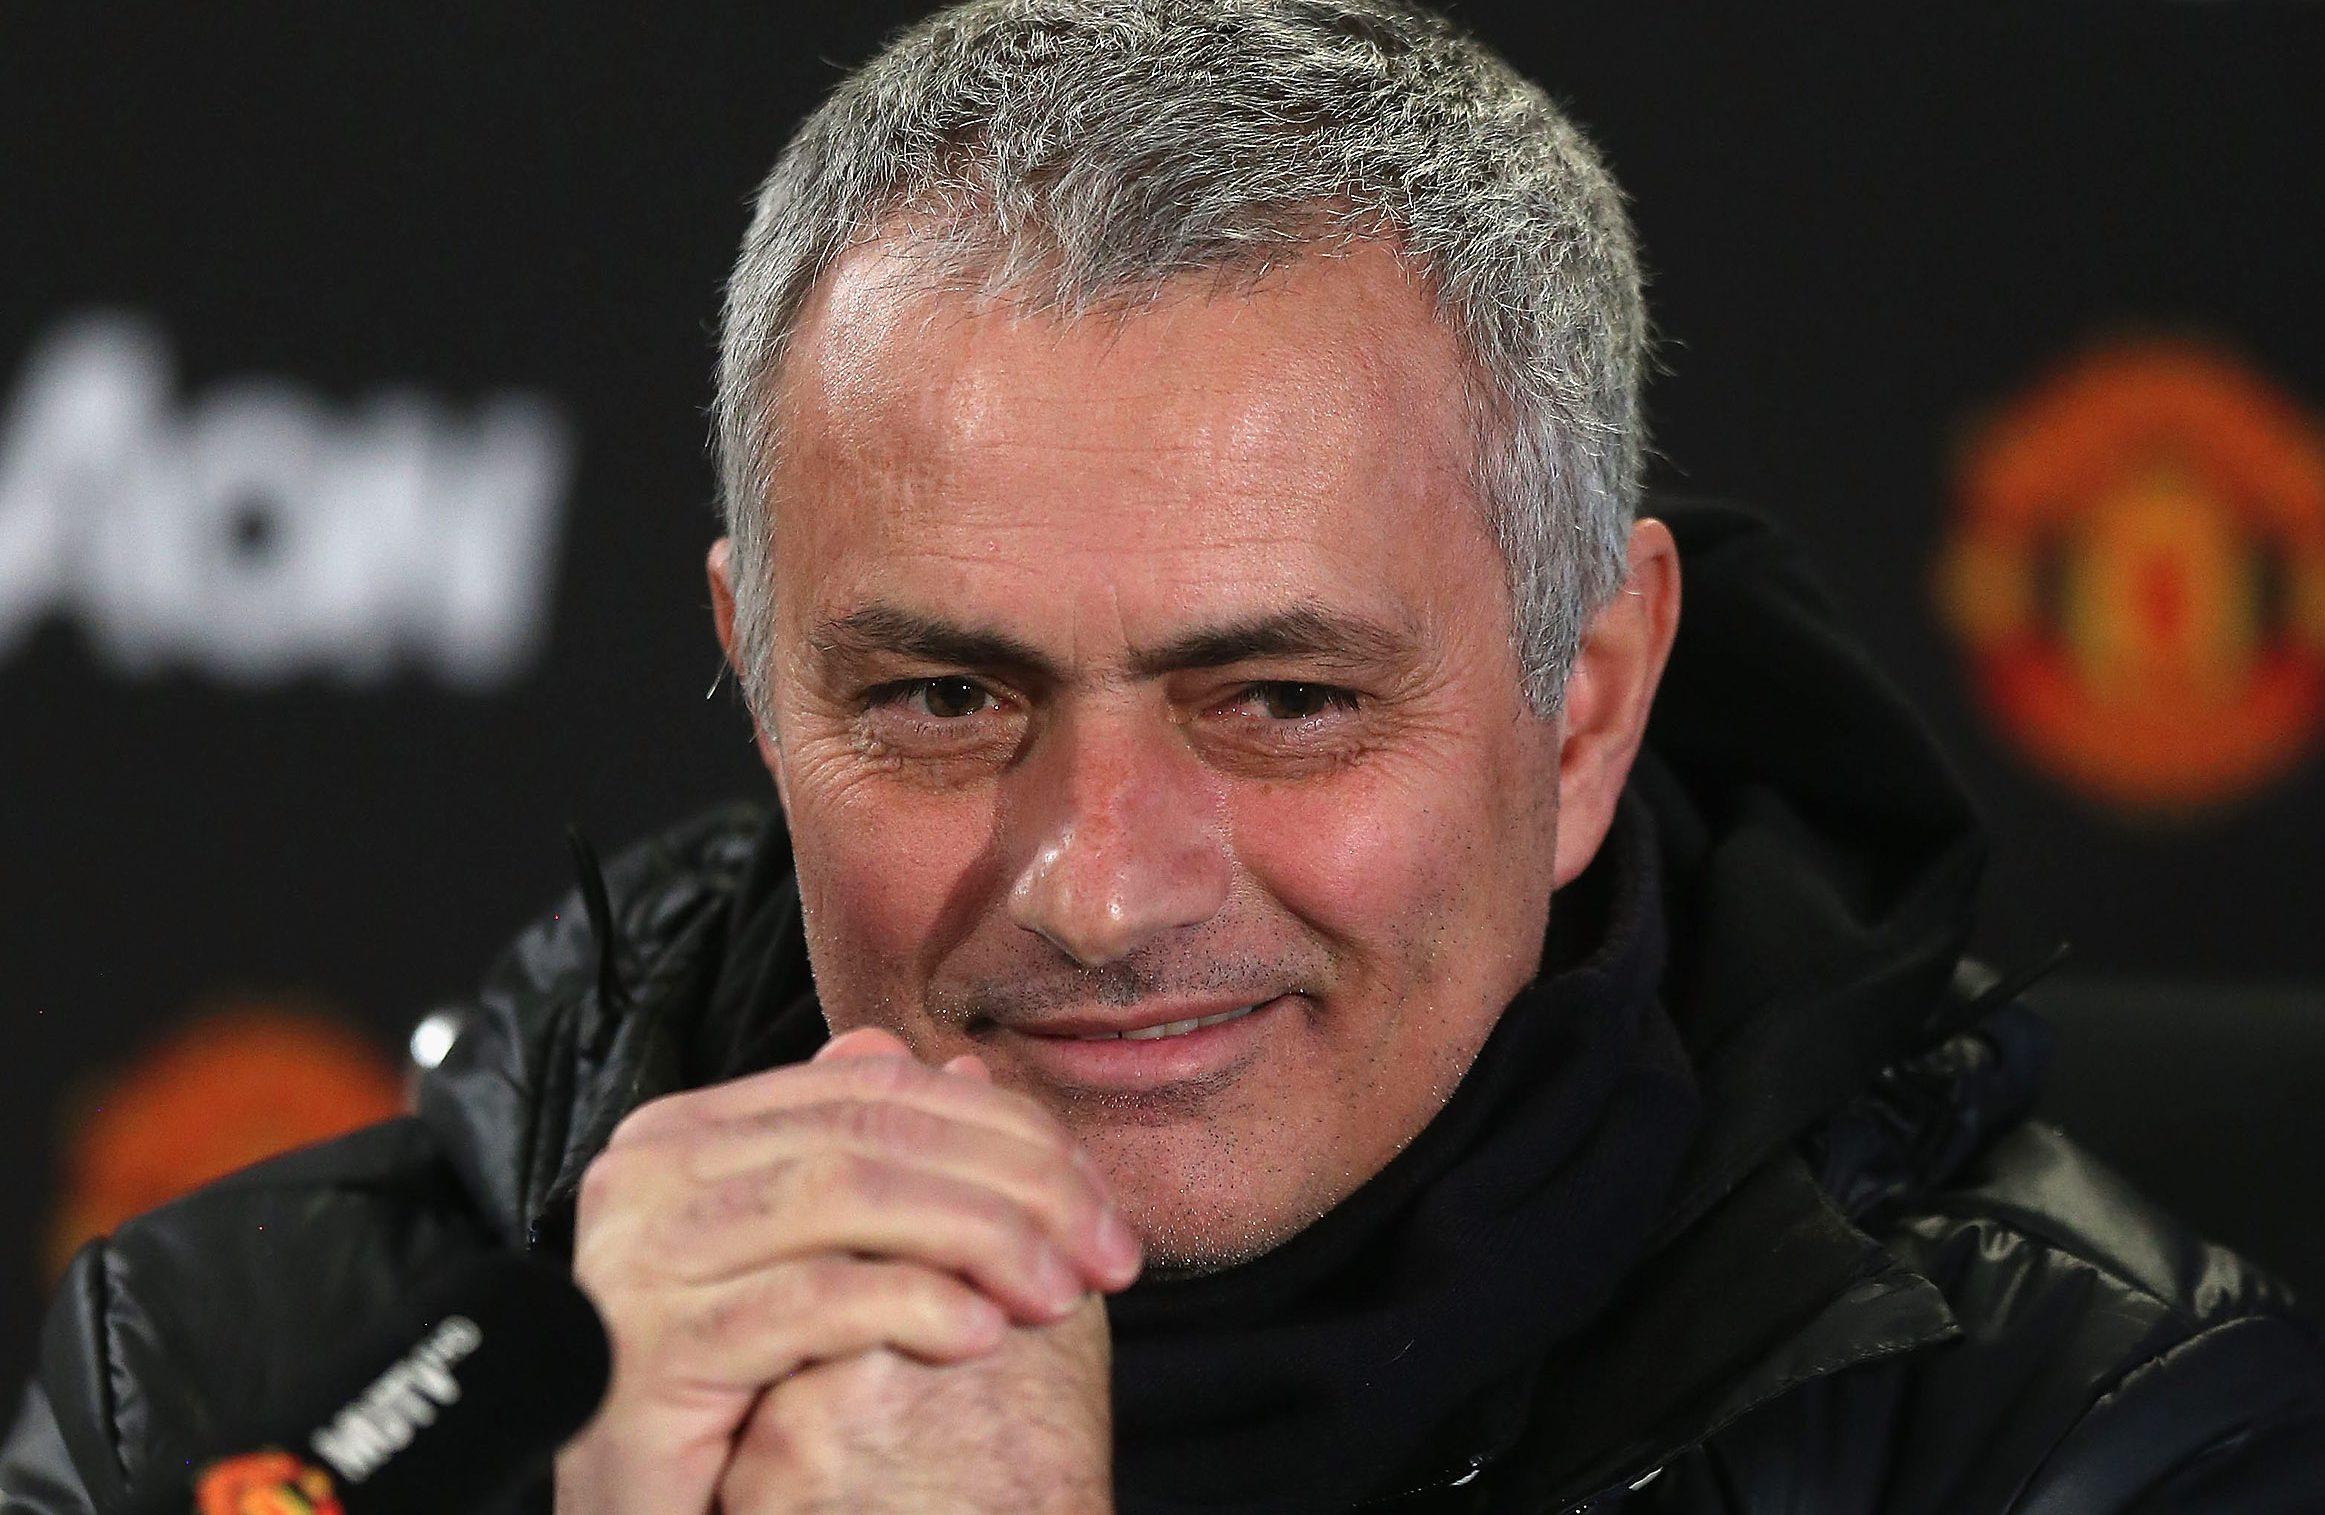 Manchester United ready to launch £60m bid for Romelu Lukaku